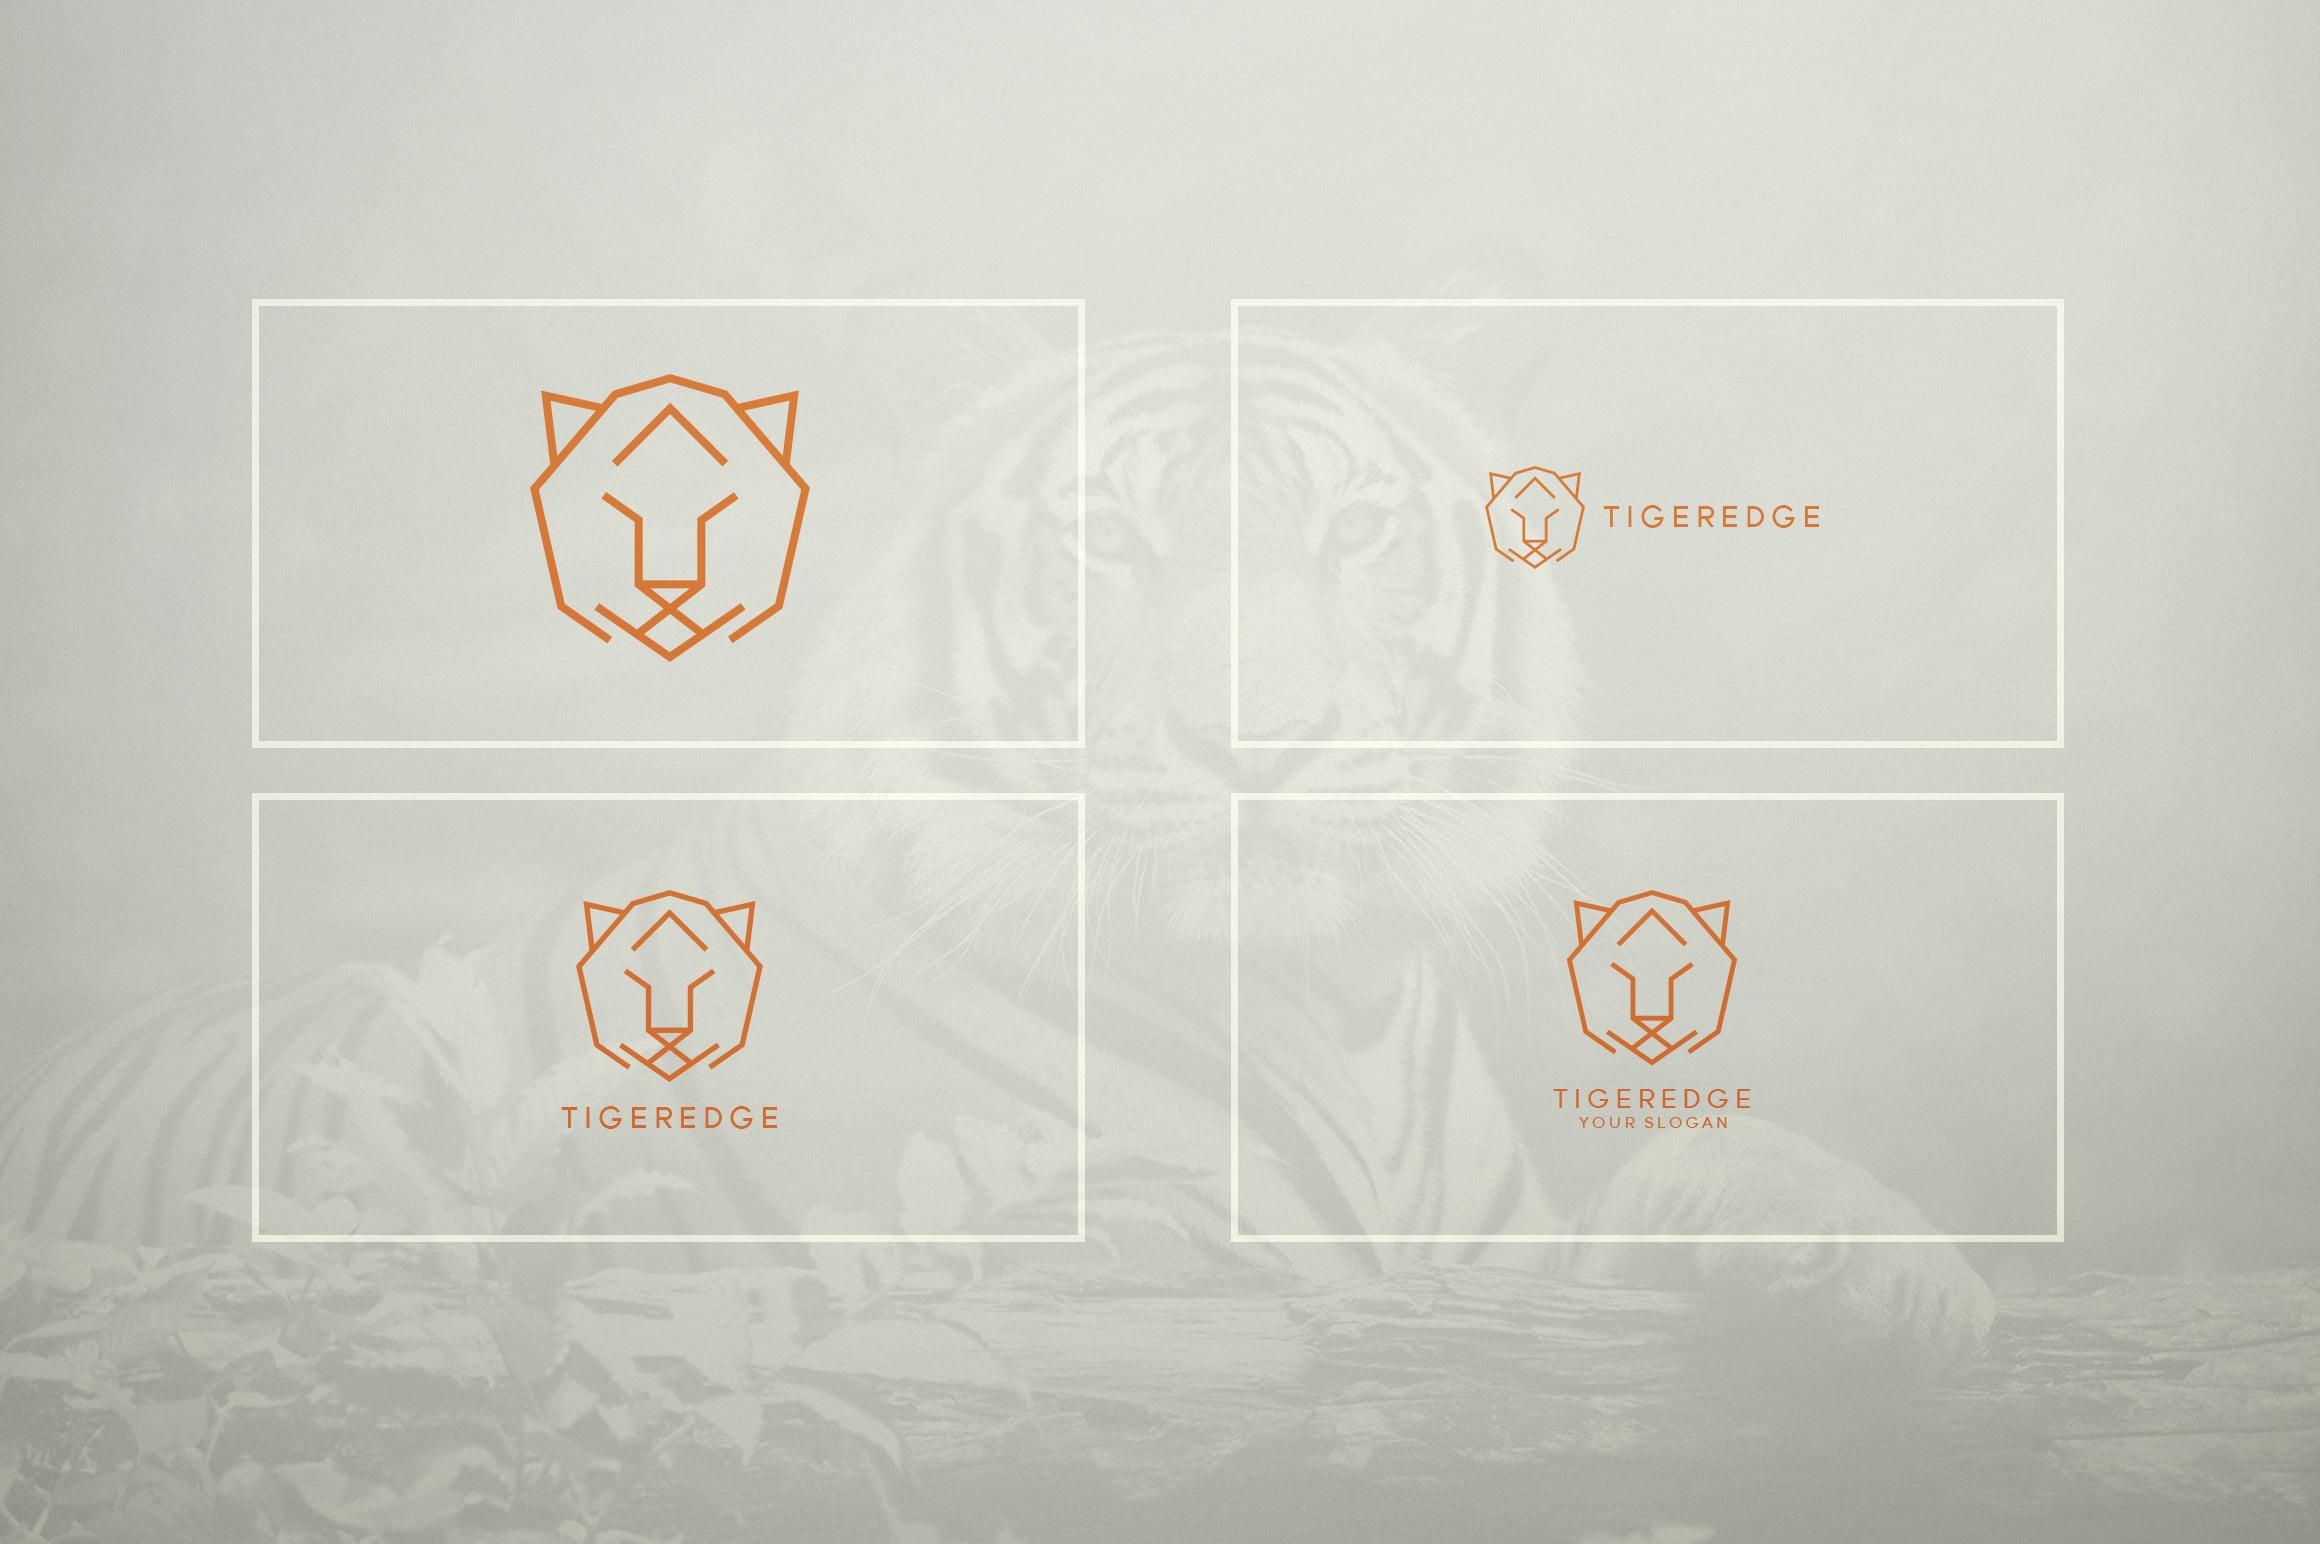 17 Geometric Animal Icons and Logos - 24